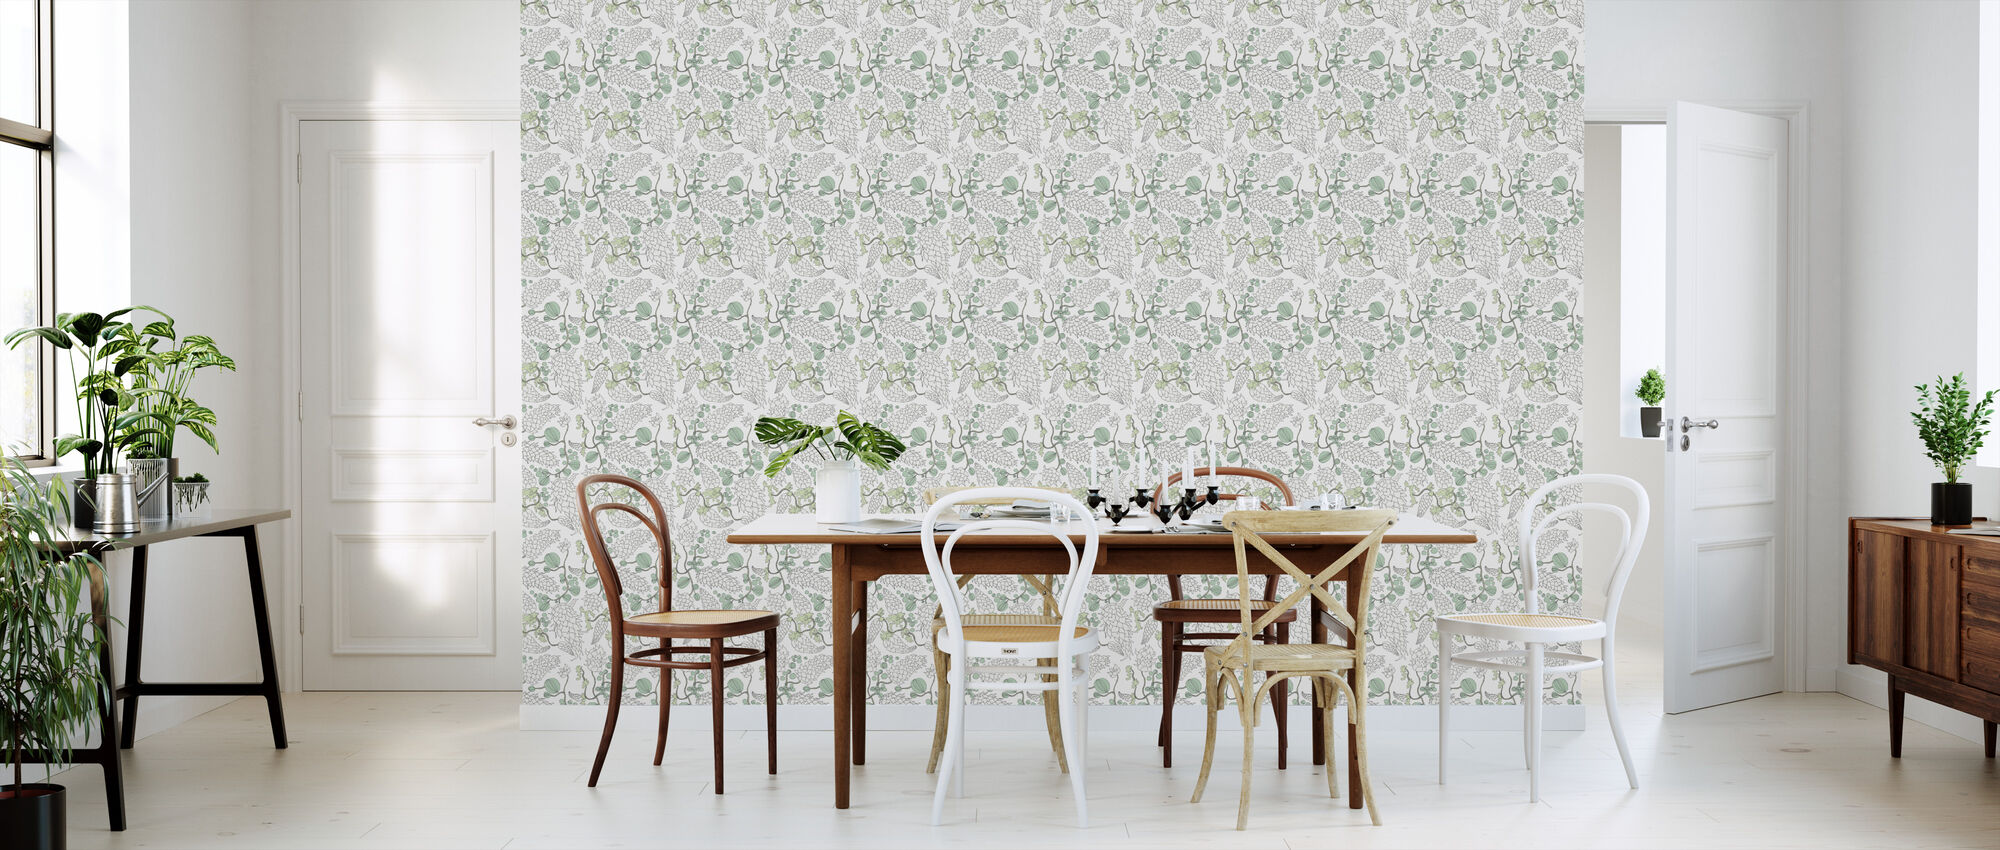 Forest - Green - Wallpaper - Kitchen